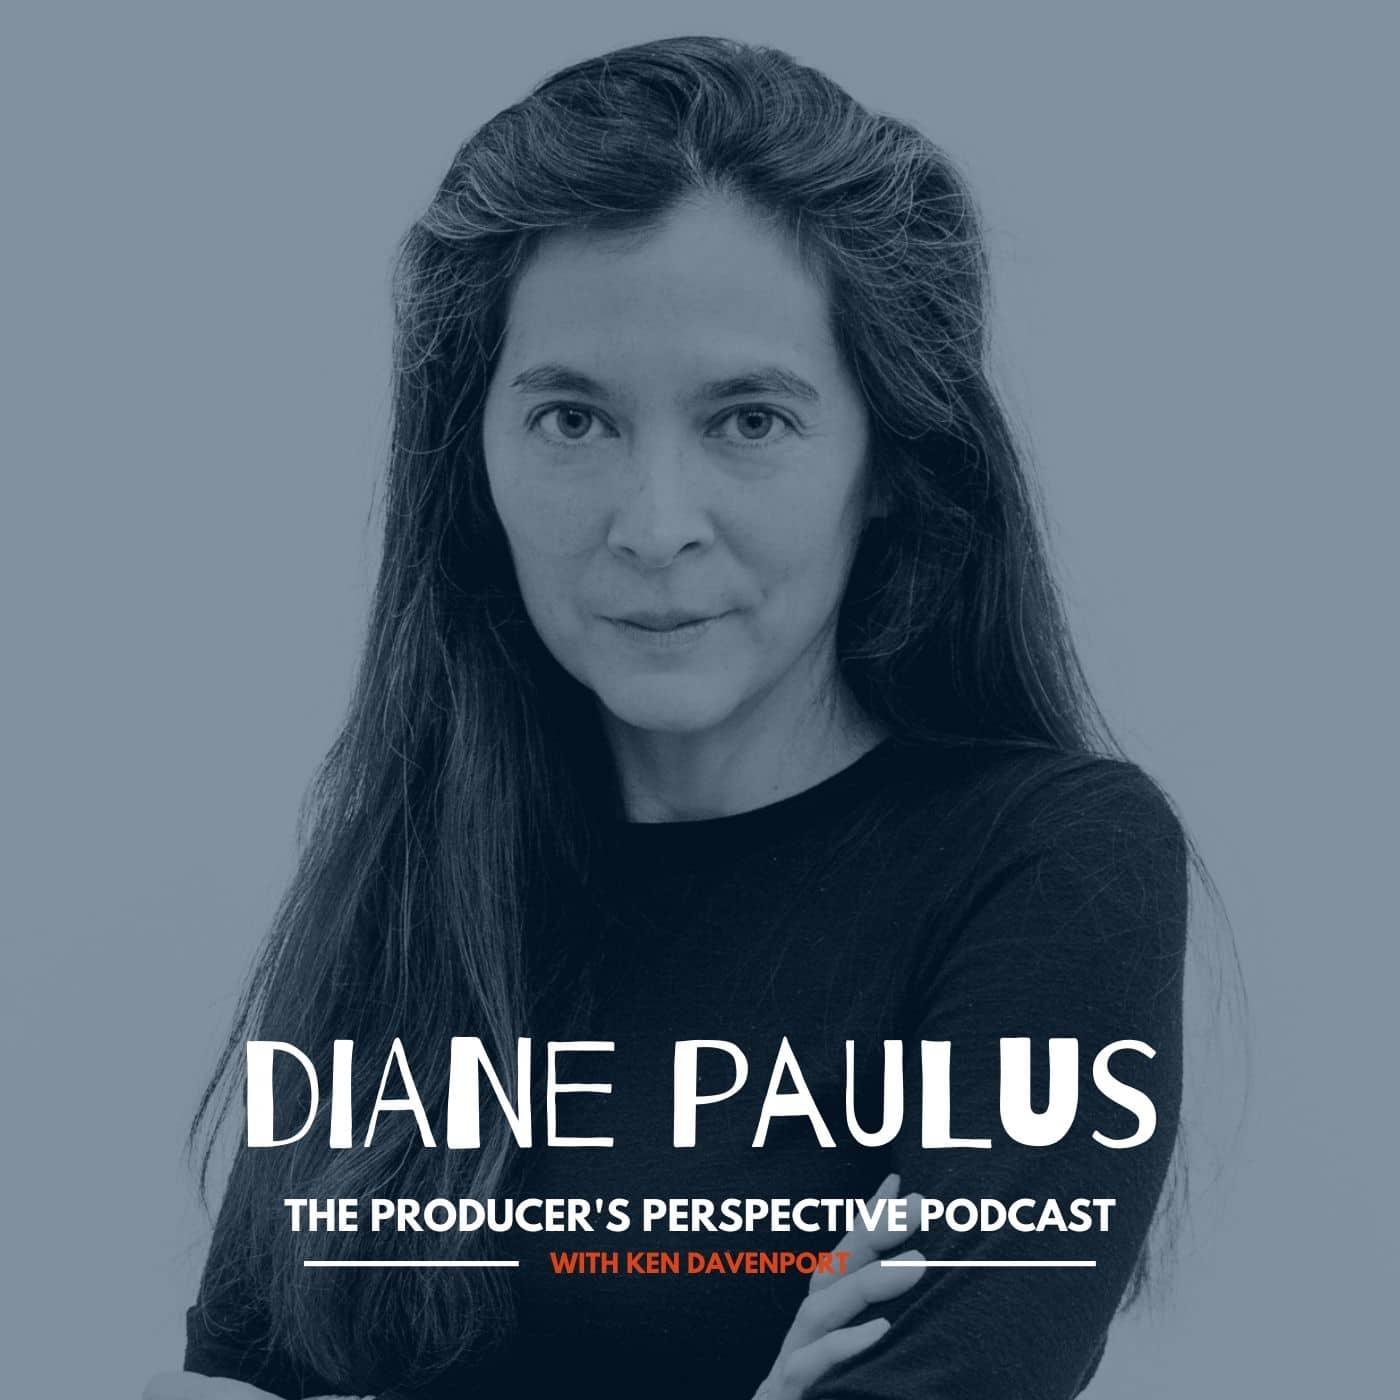 Ken Davenport's The Producer's Perspective Podcast Episode 54 - Diane Paulus